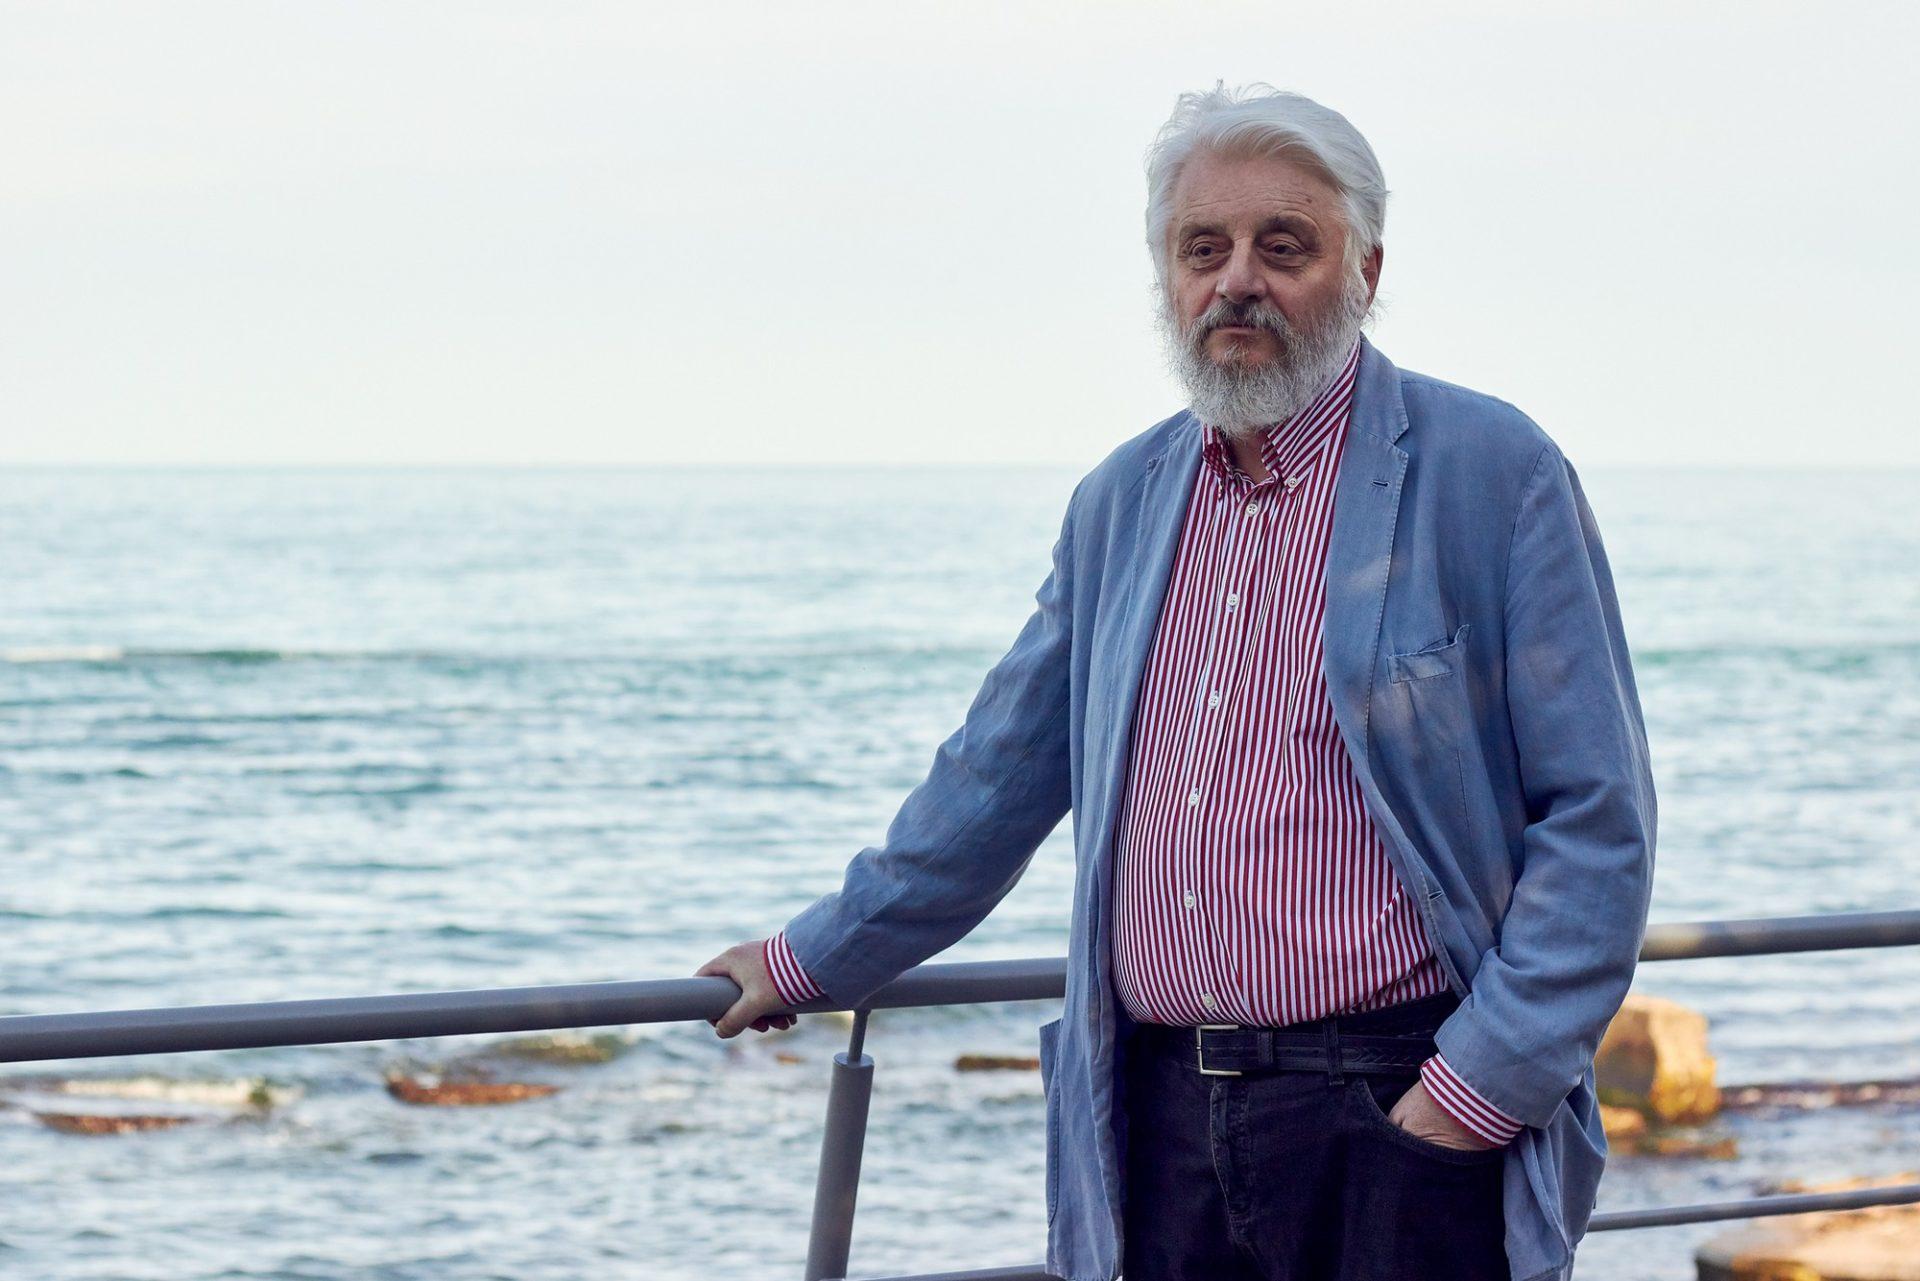 Борис Херсонський / Фото: Zhvalevskyi Bogdan